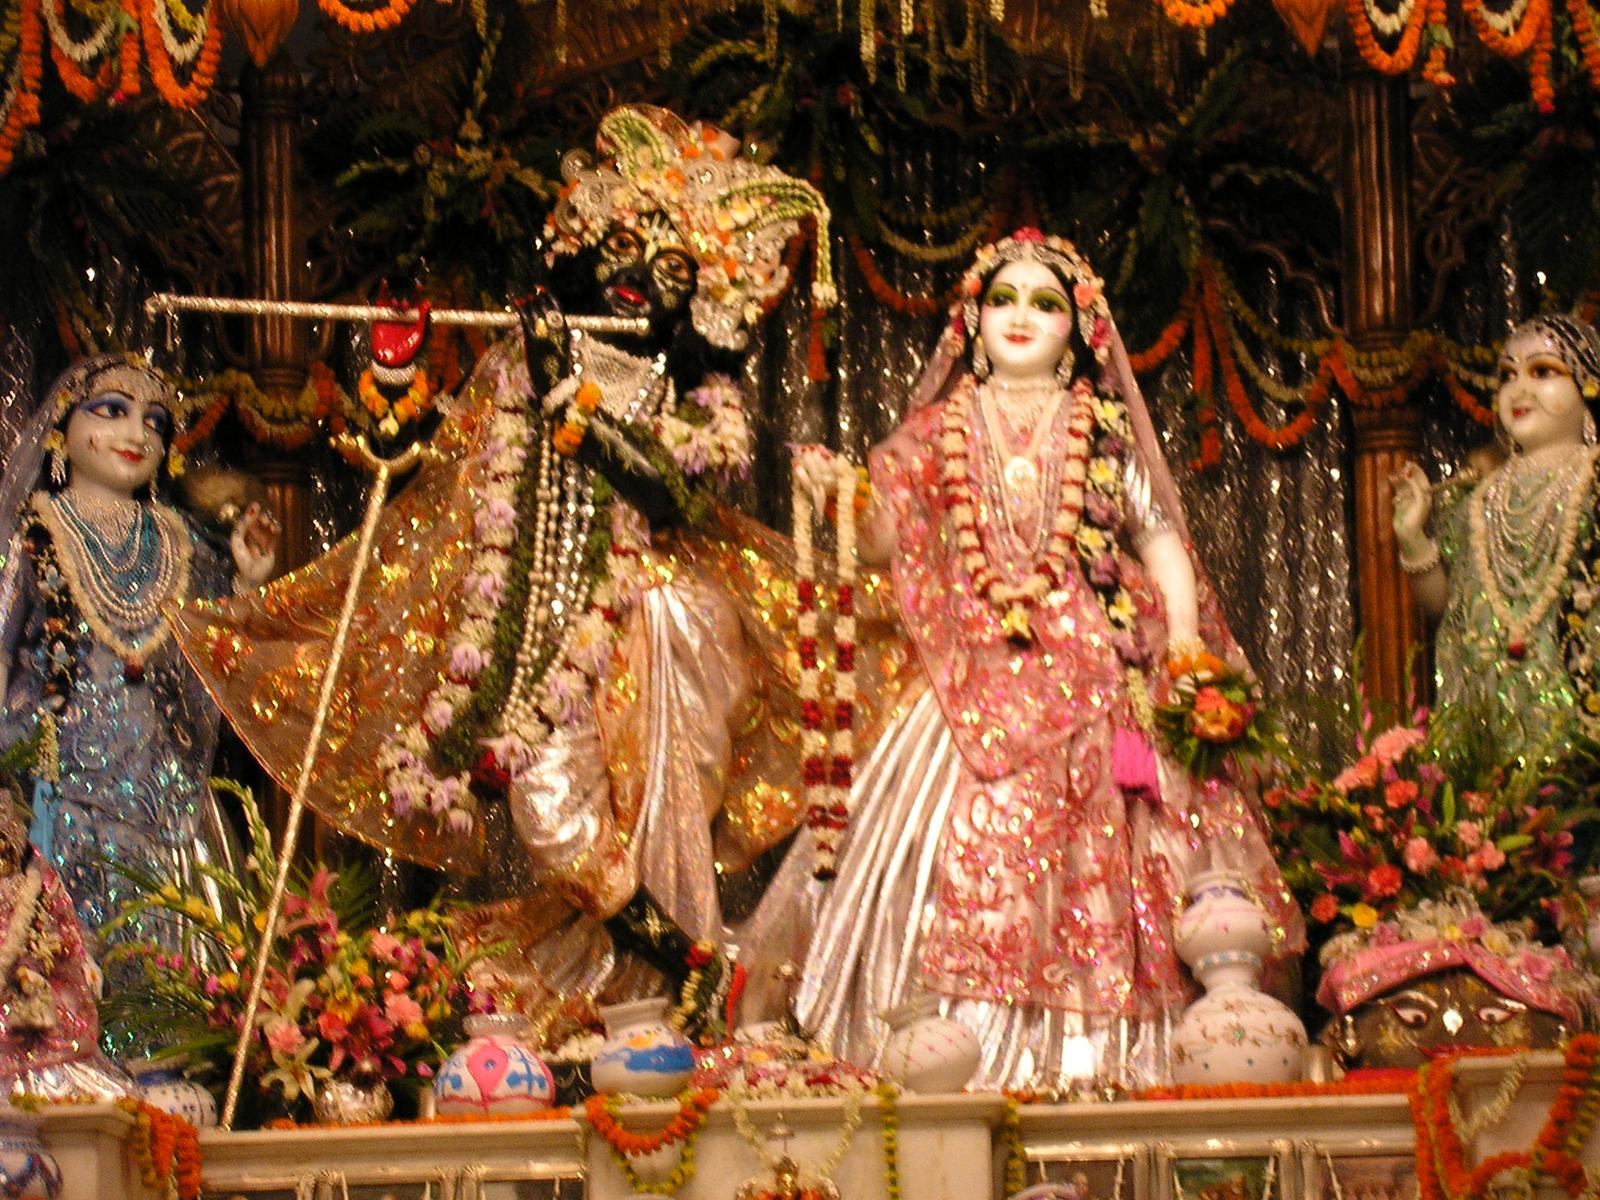 PunjabKesari, Sri Krishna, Radha krishan, राधा कृष्ण